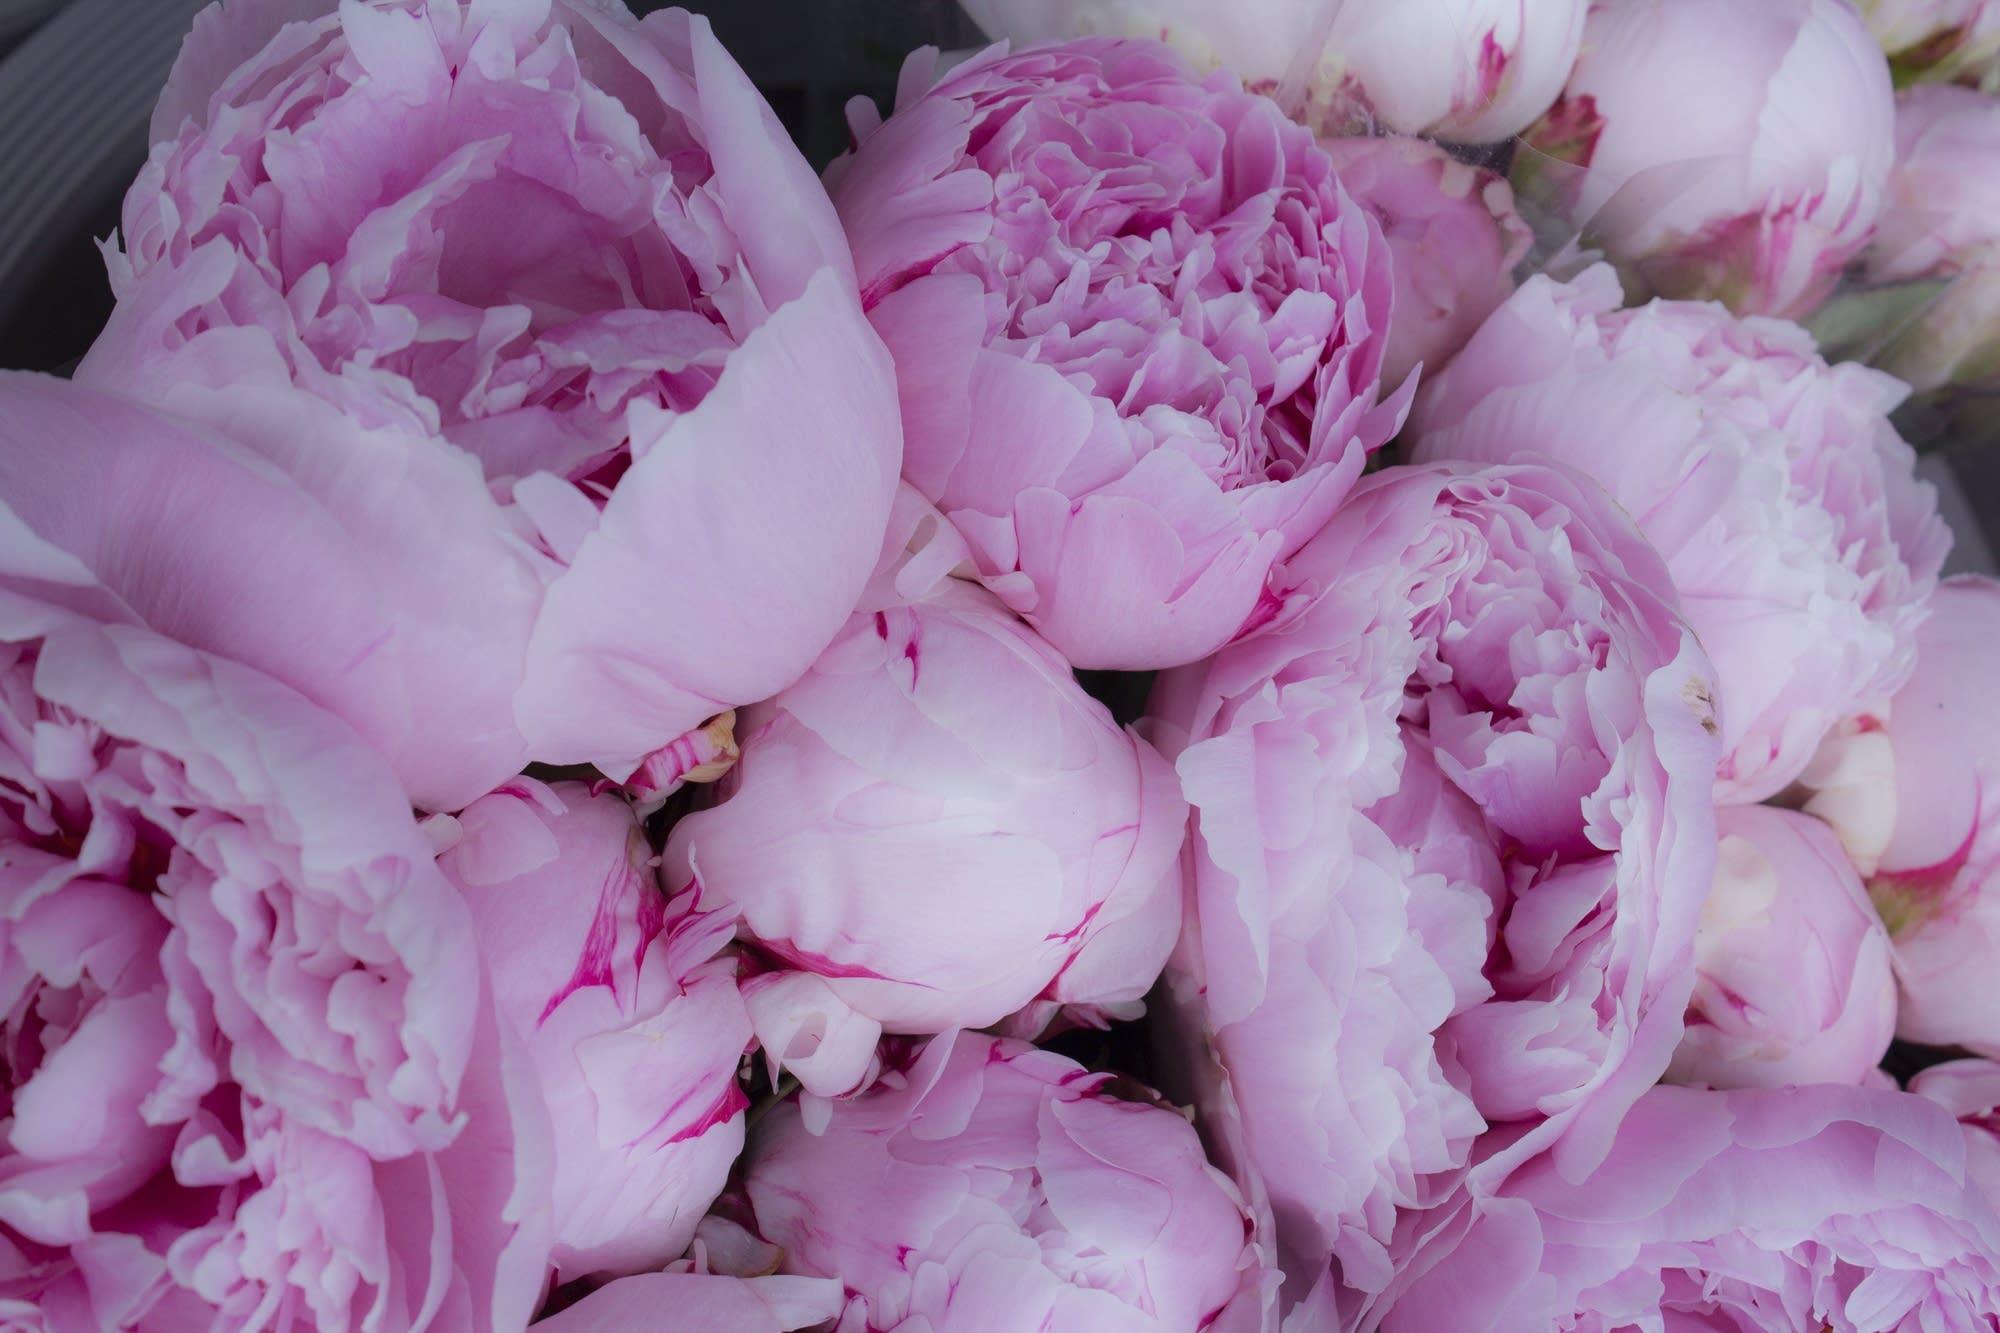 Alesund - 05 - pink flowers